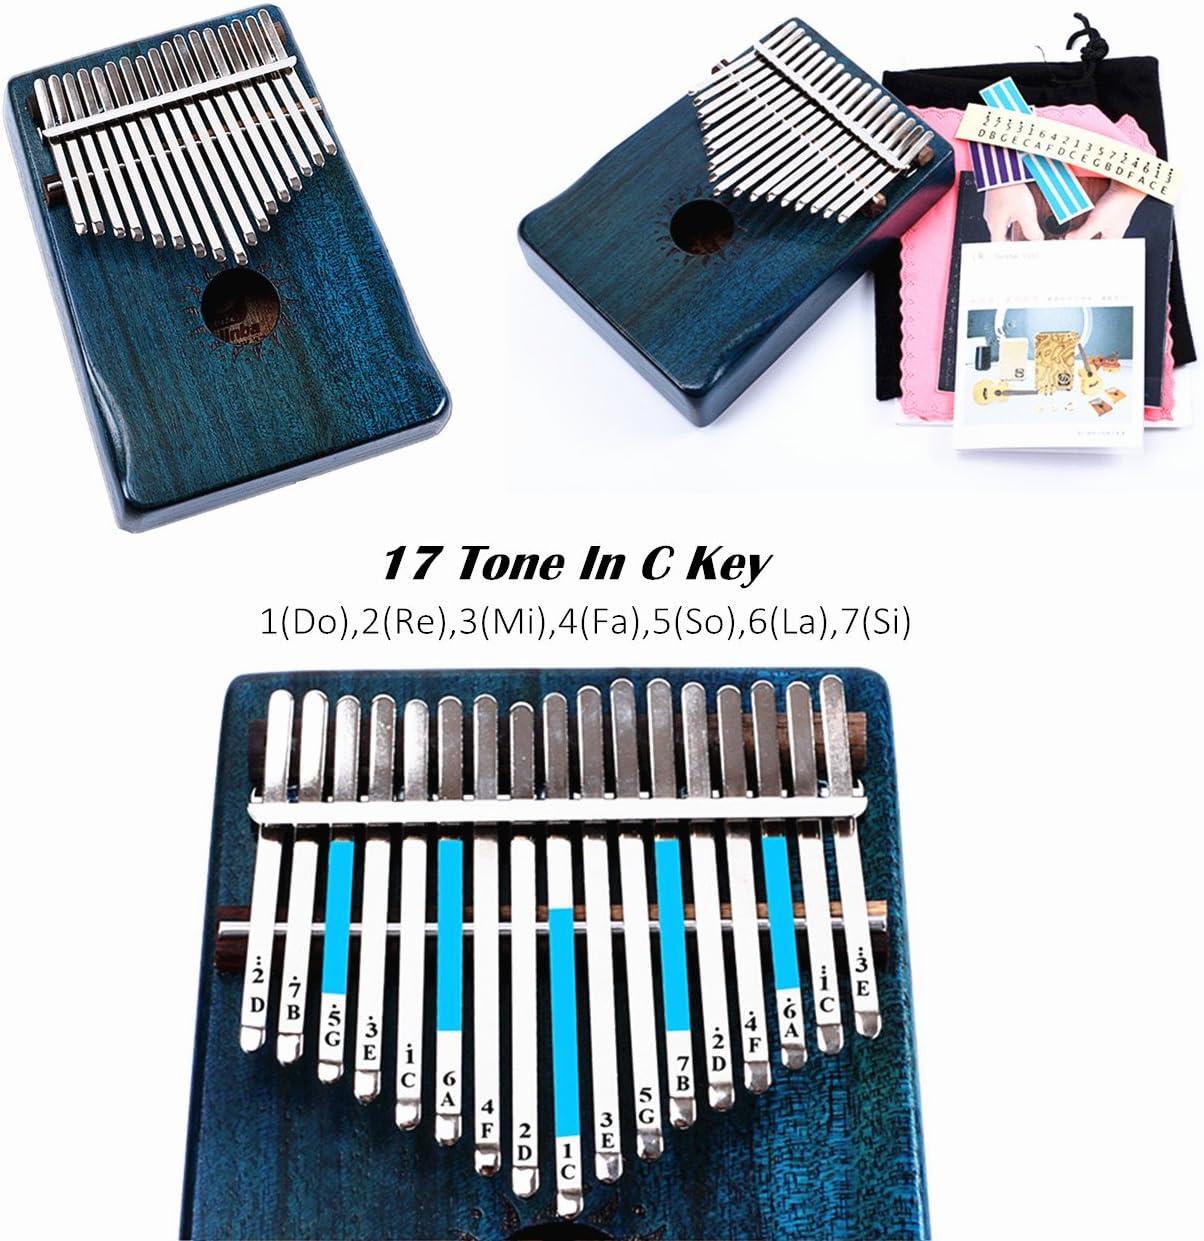 Jroyseter Carimba Thumb Piano 17 Tone Massivholz Piano Box Ore Metal Key Aussprache Genaue Resonanz Sch/önes Instrumentenzubeh/ör 1